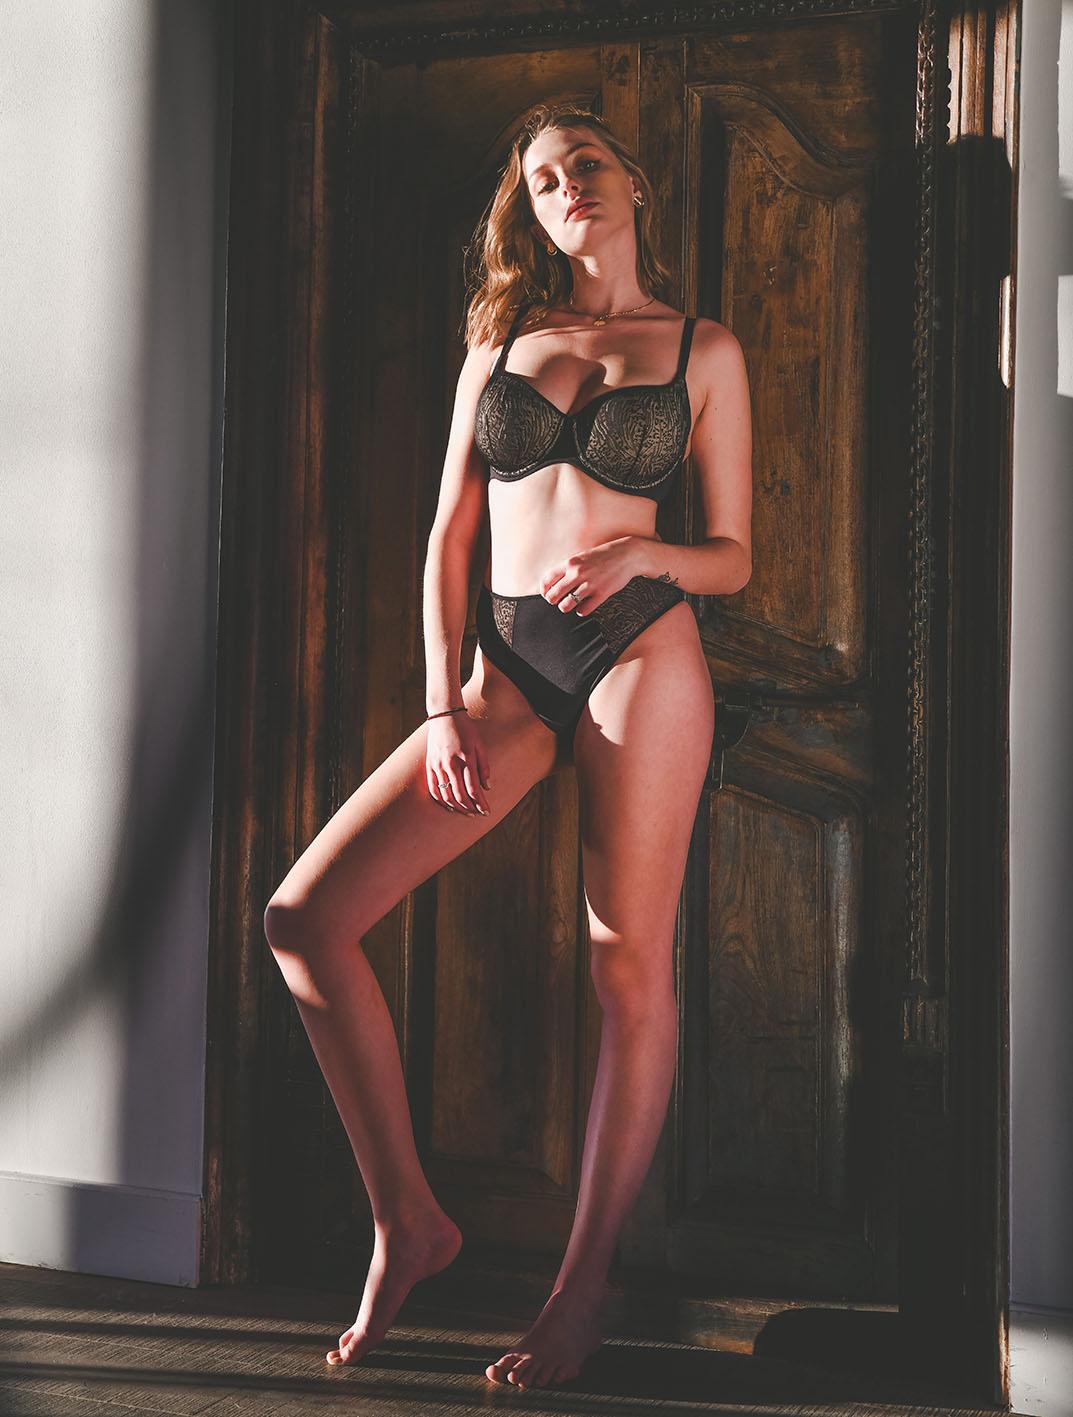 @lingerie-Leel-photographe-laurent-scavone-6h1